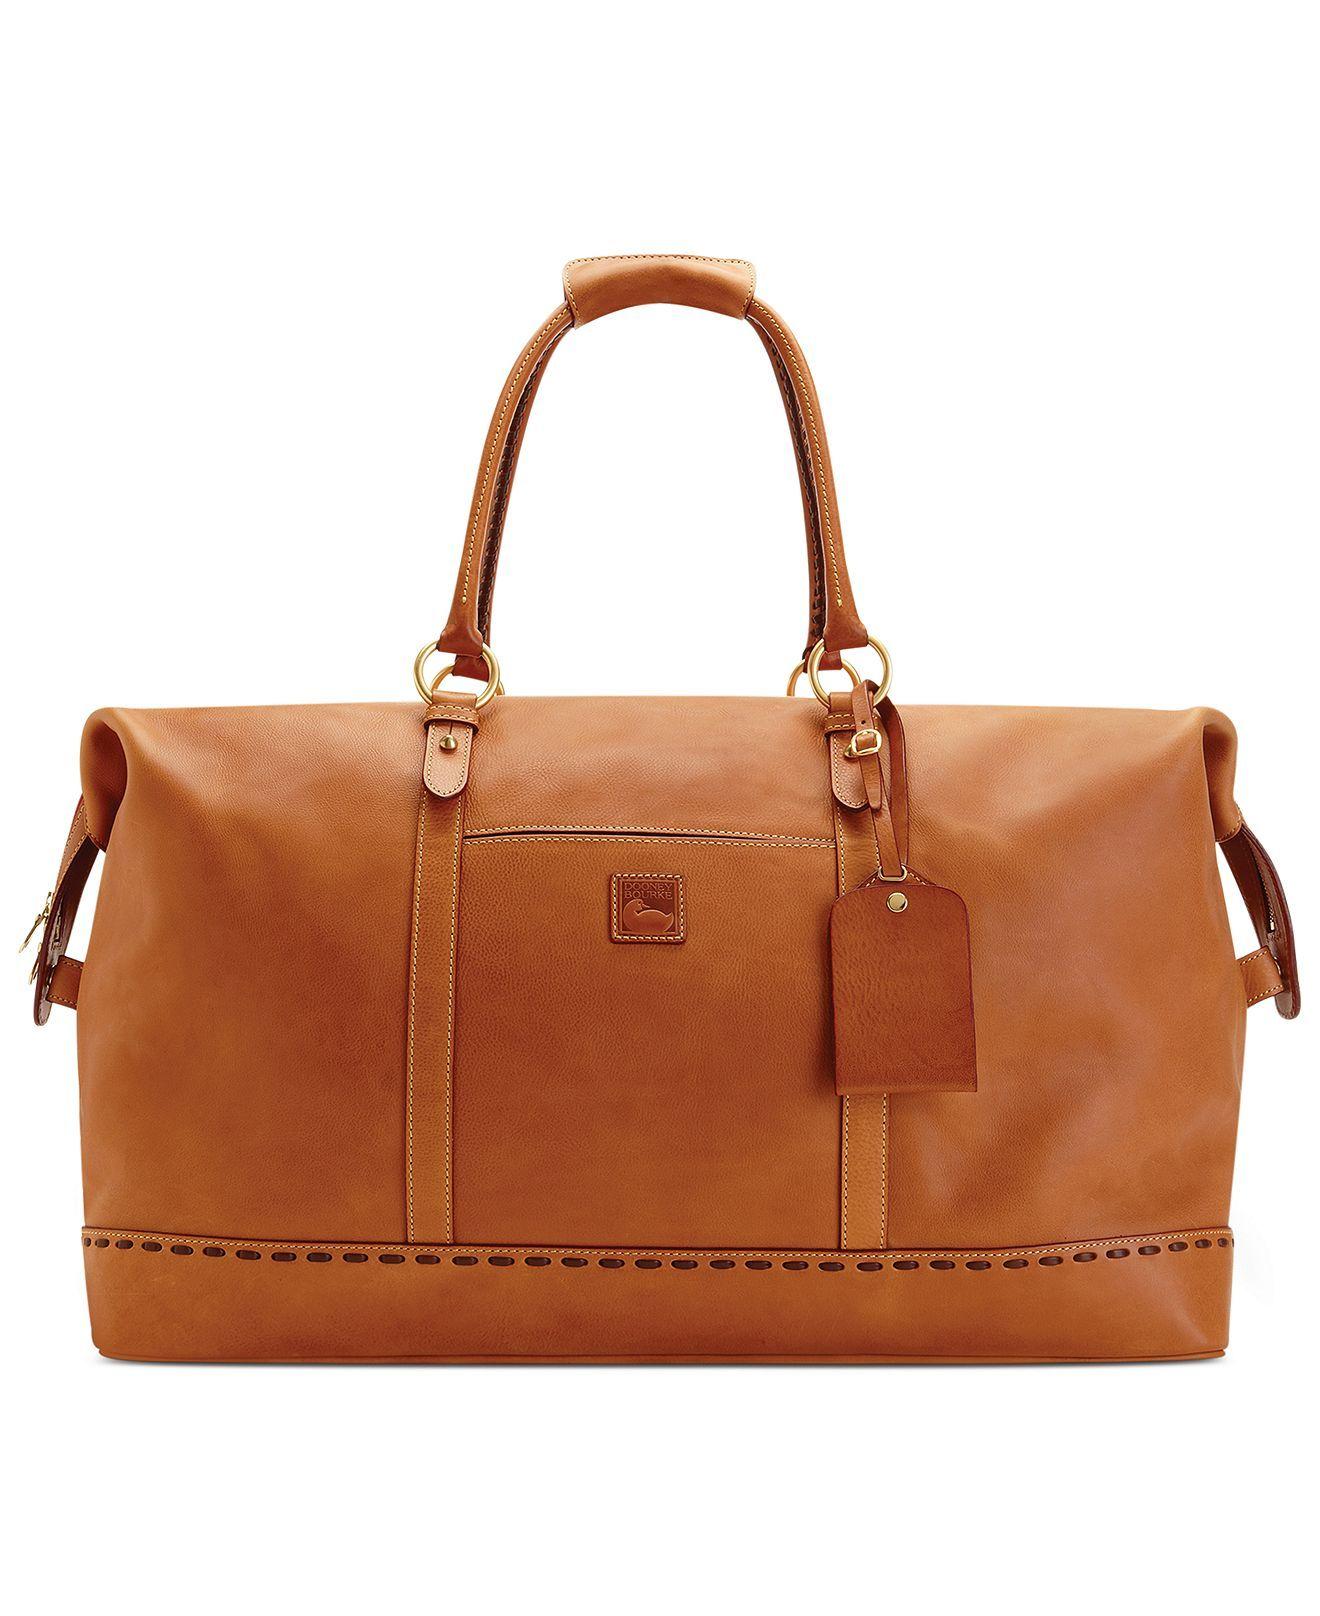 Dooney & Bourke Handbag, Florentine Medium Duffle - Handbags & Accessories - Macy's